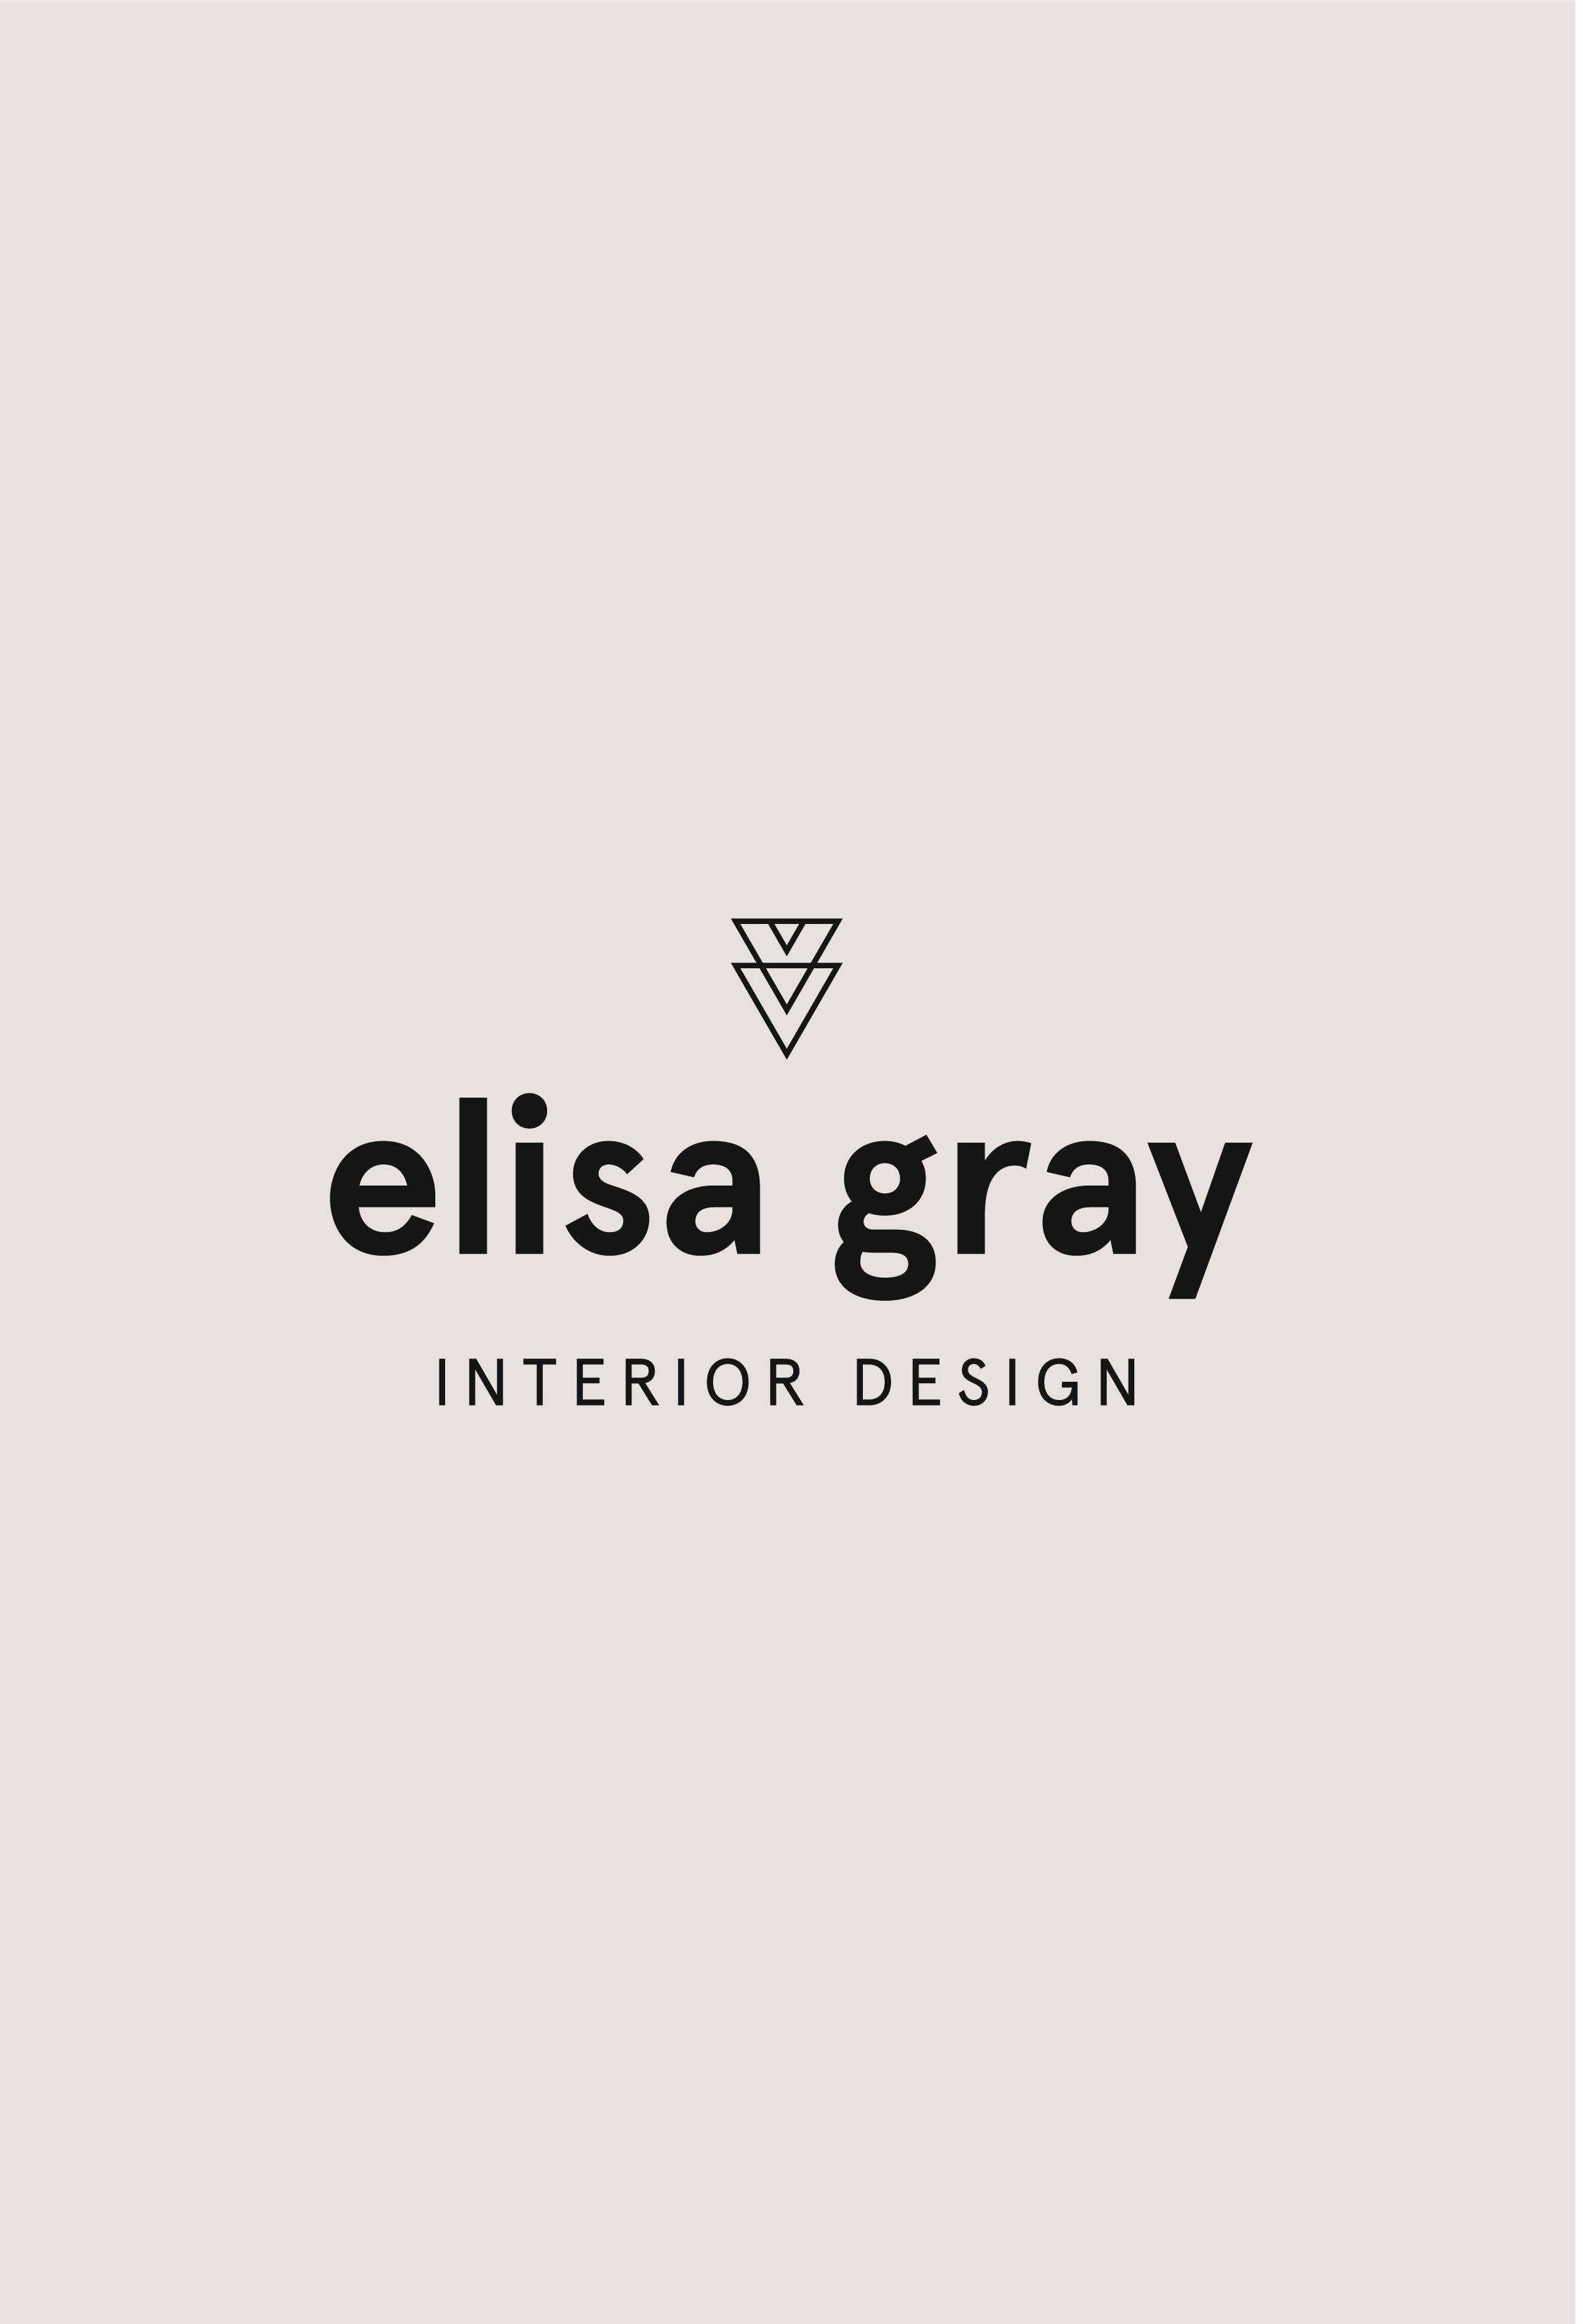 Interior Design Premade Logo Design, Modern Designer Logo, Sans Serif Logo  Template, Logo Branding For Creative Businesses, Branding Design.